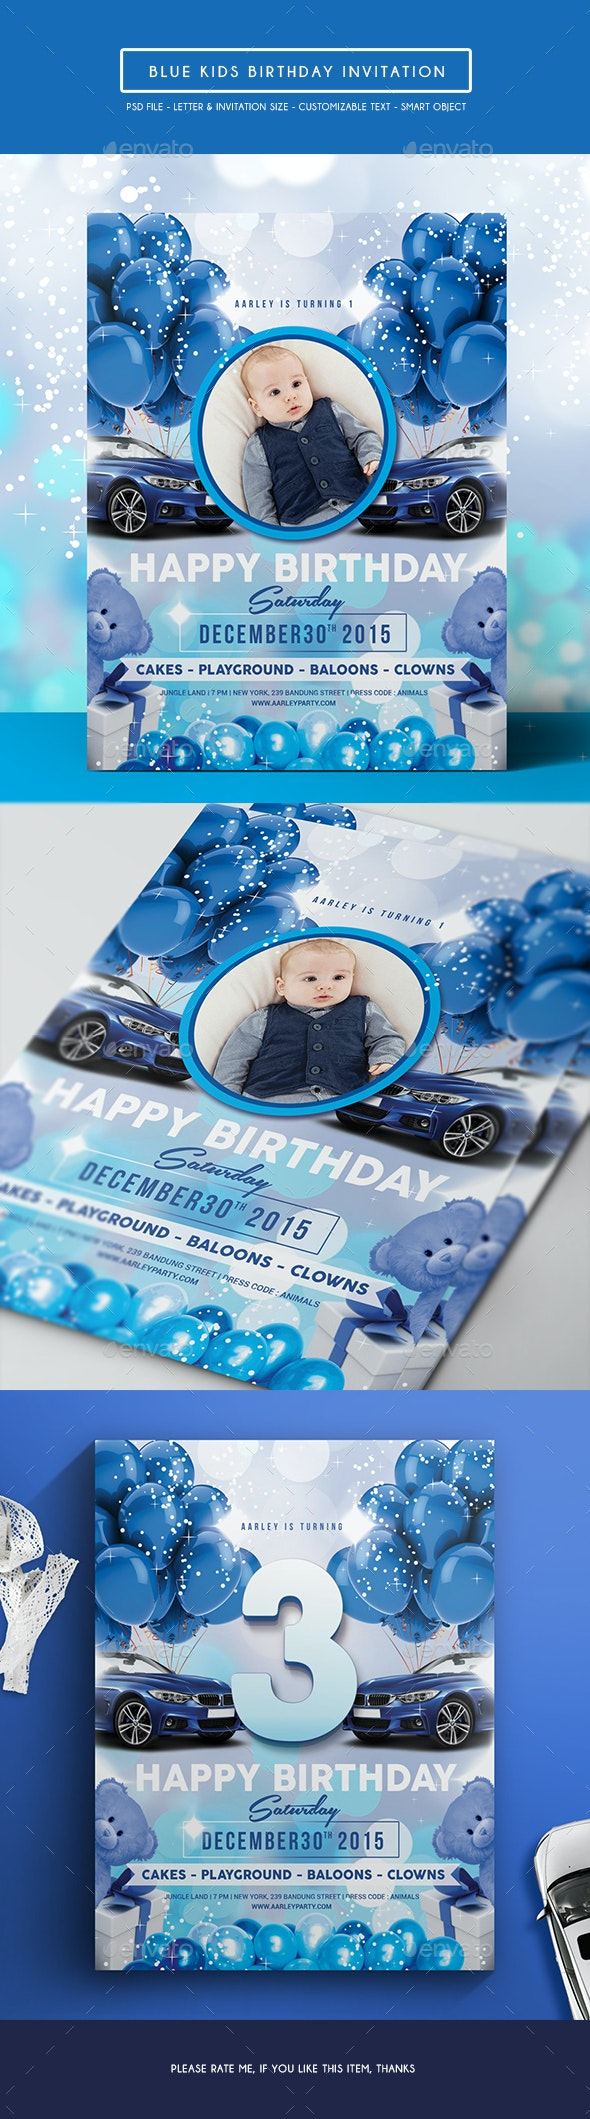 Blue Kids Birthday Invitation - Birthday Greeting Cards